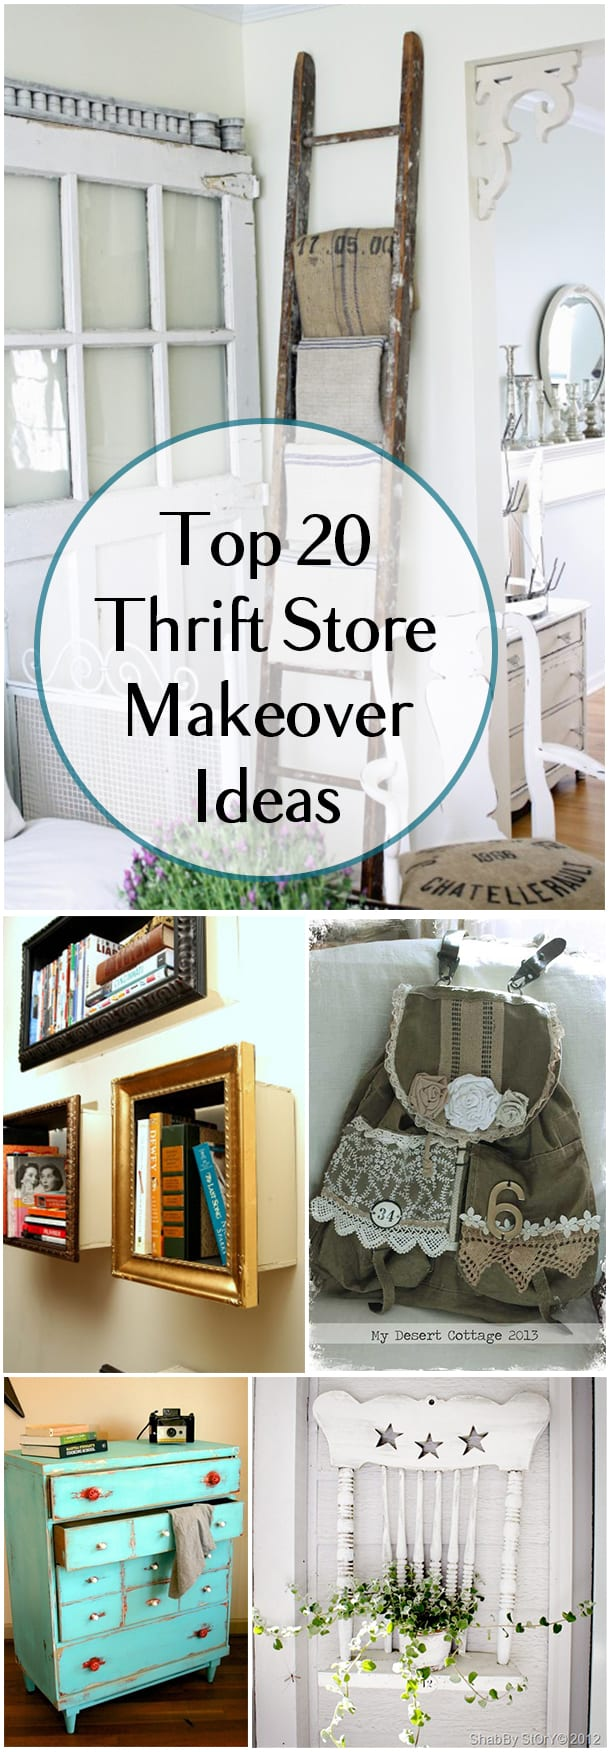 Thrift Store Makeover, Thrift Store, DIY Thrift Store Makeover Ideas, Thrift Store DIY, Thrift Store Upcycle, Furniture Makeover, Furniture Makeover DIY